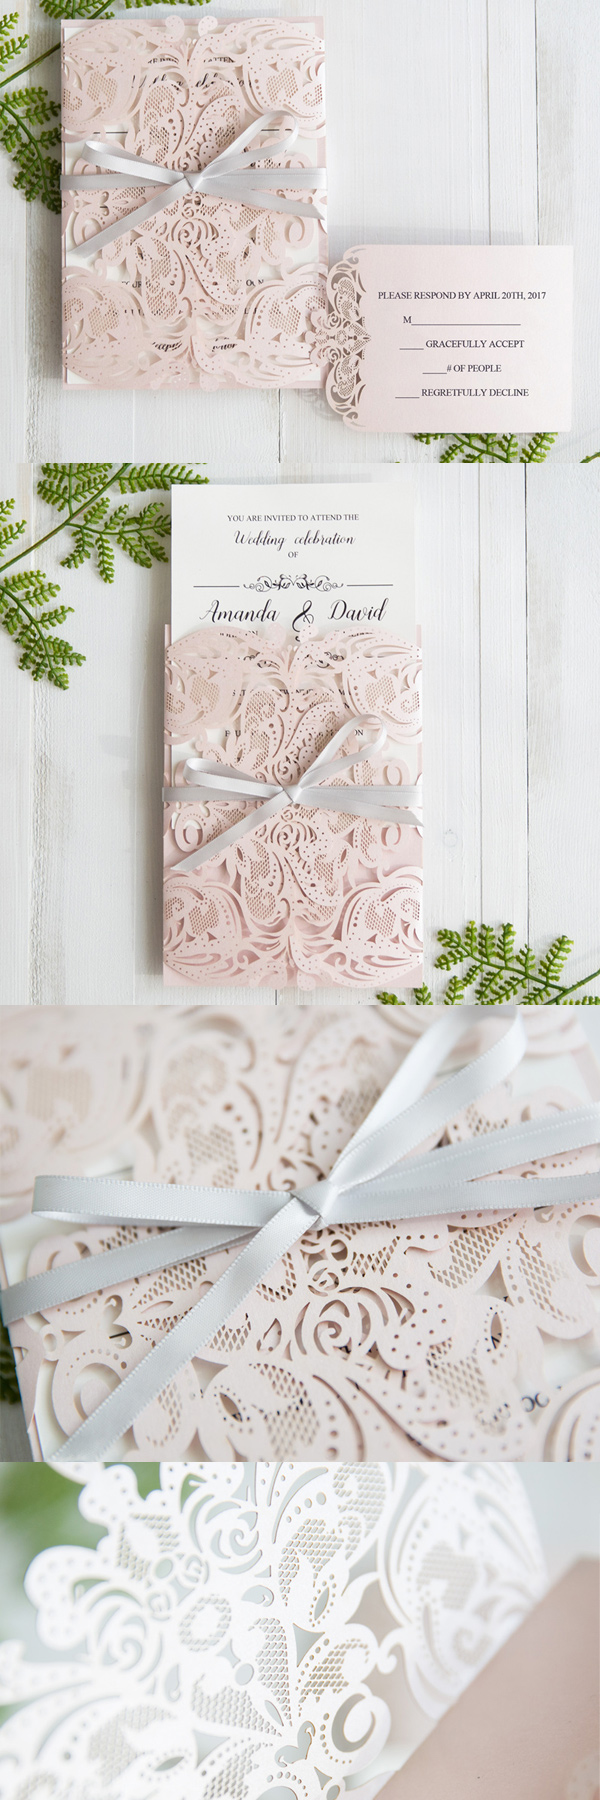 Elegant Blush Pink Laser Cut Wedding Invitation With